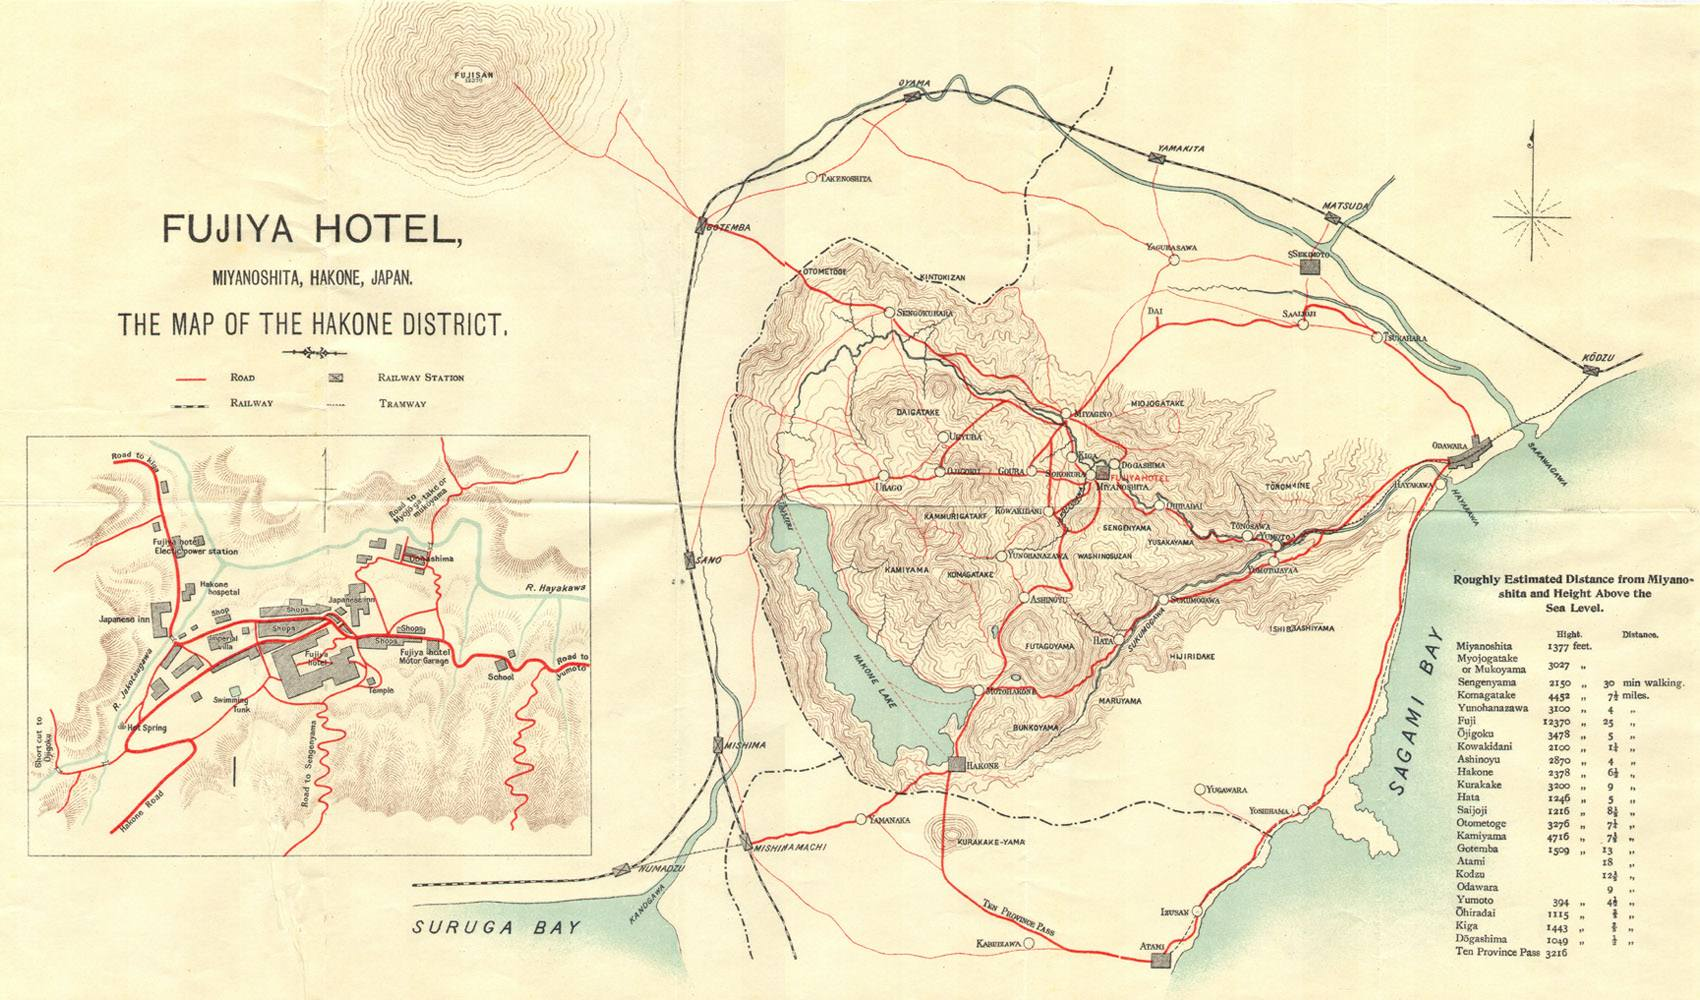 Book Fujiya Hotel Miyanoshita Japan C Guide - Japan map 1920